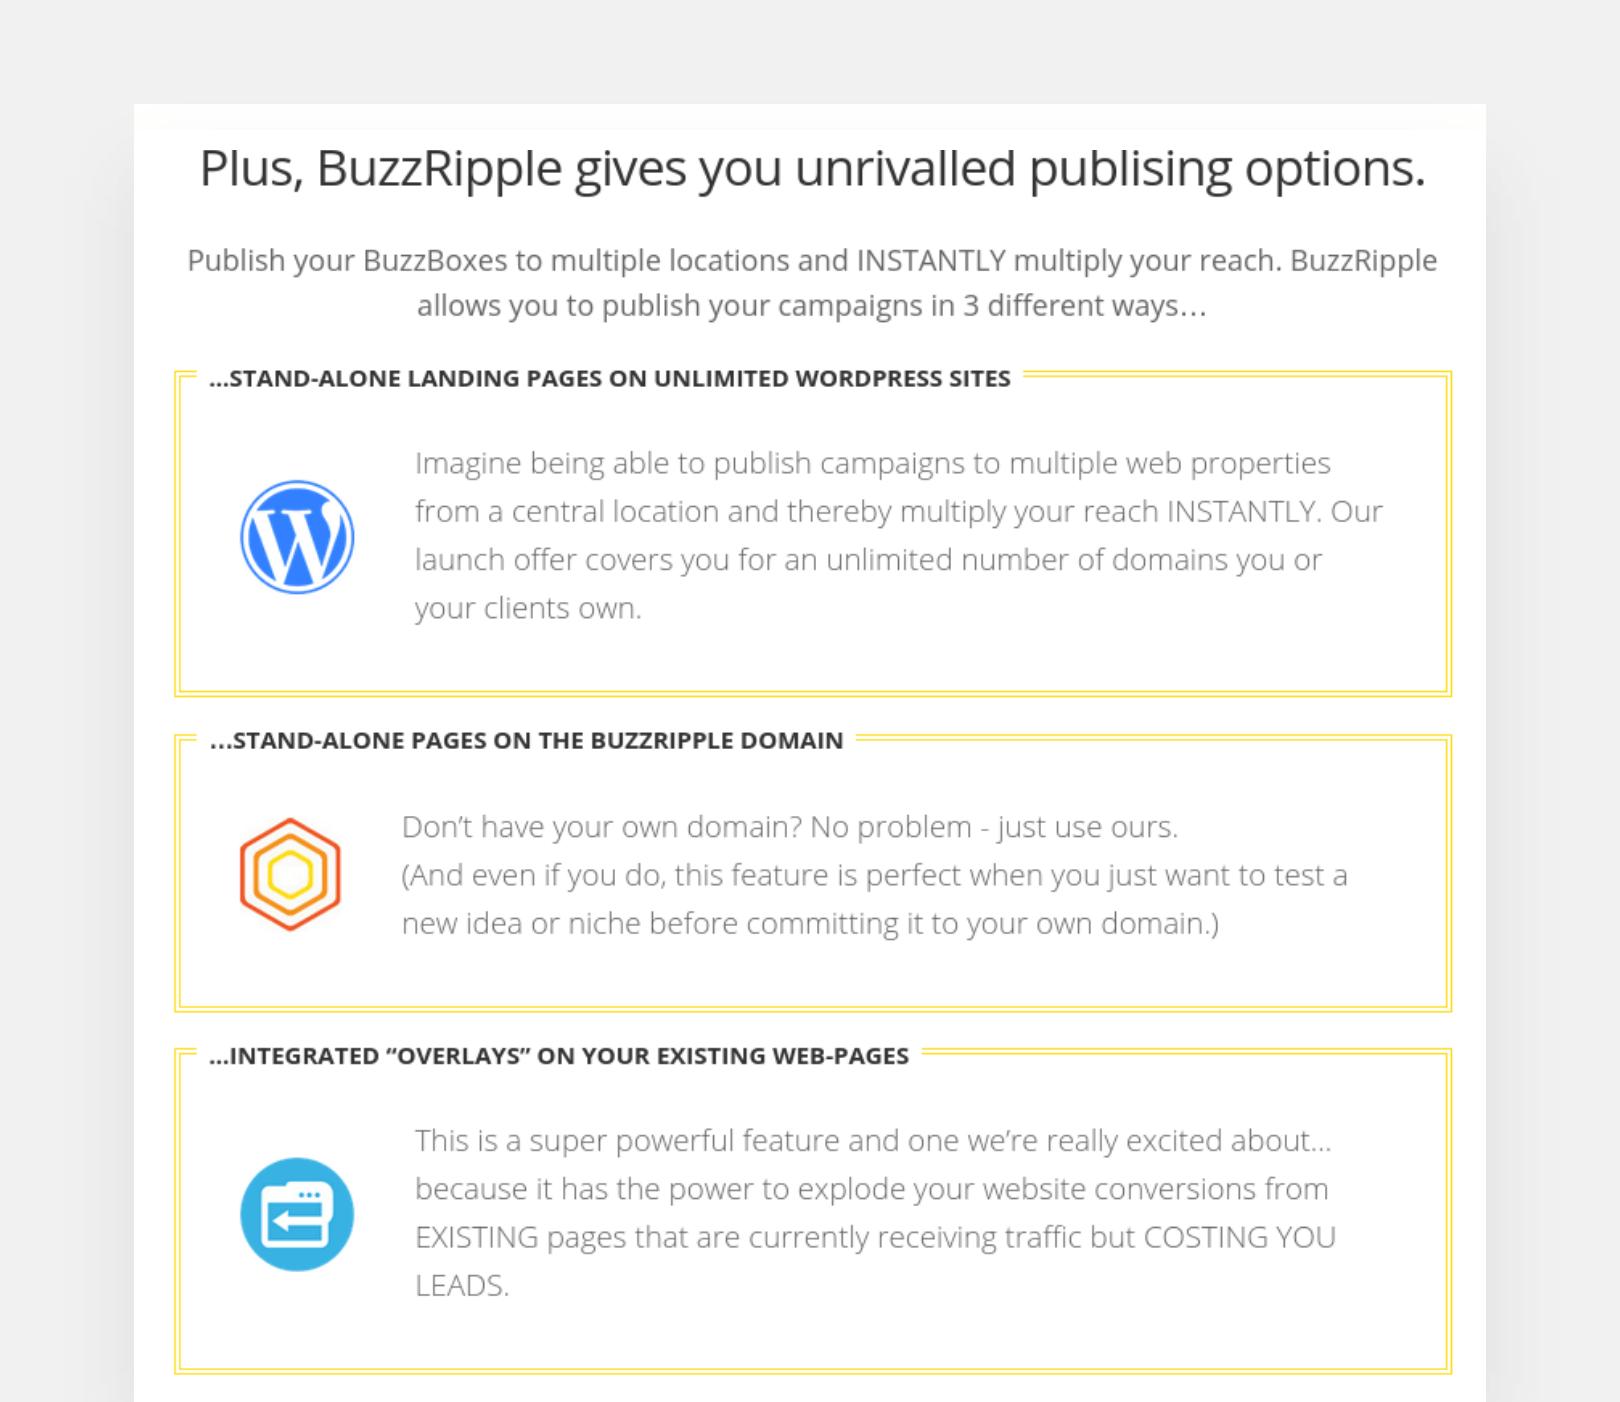 BuzzRipple publishing options screenshot